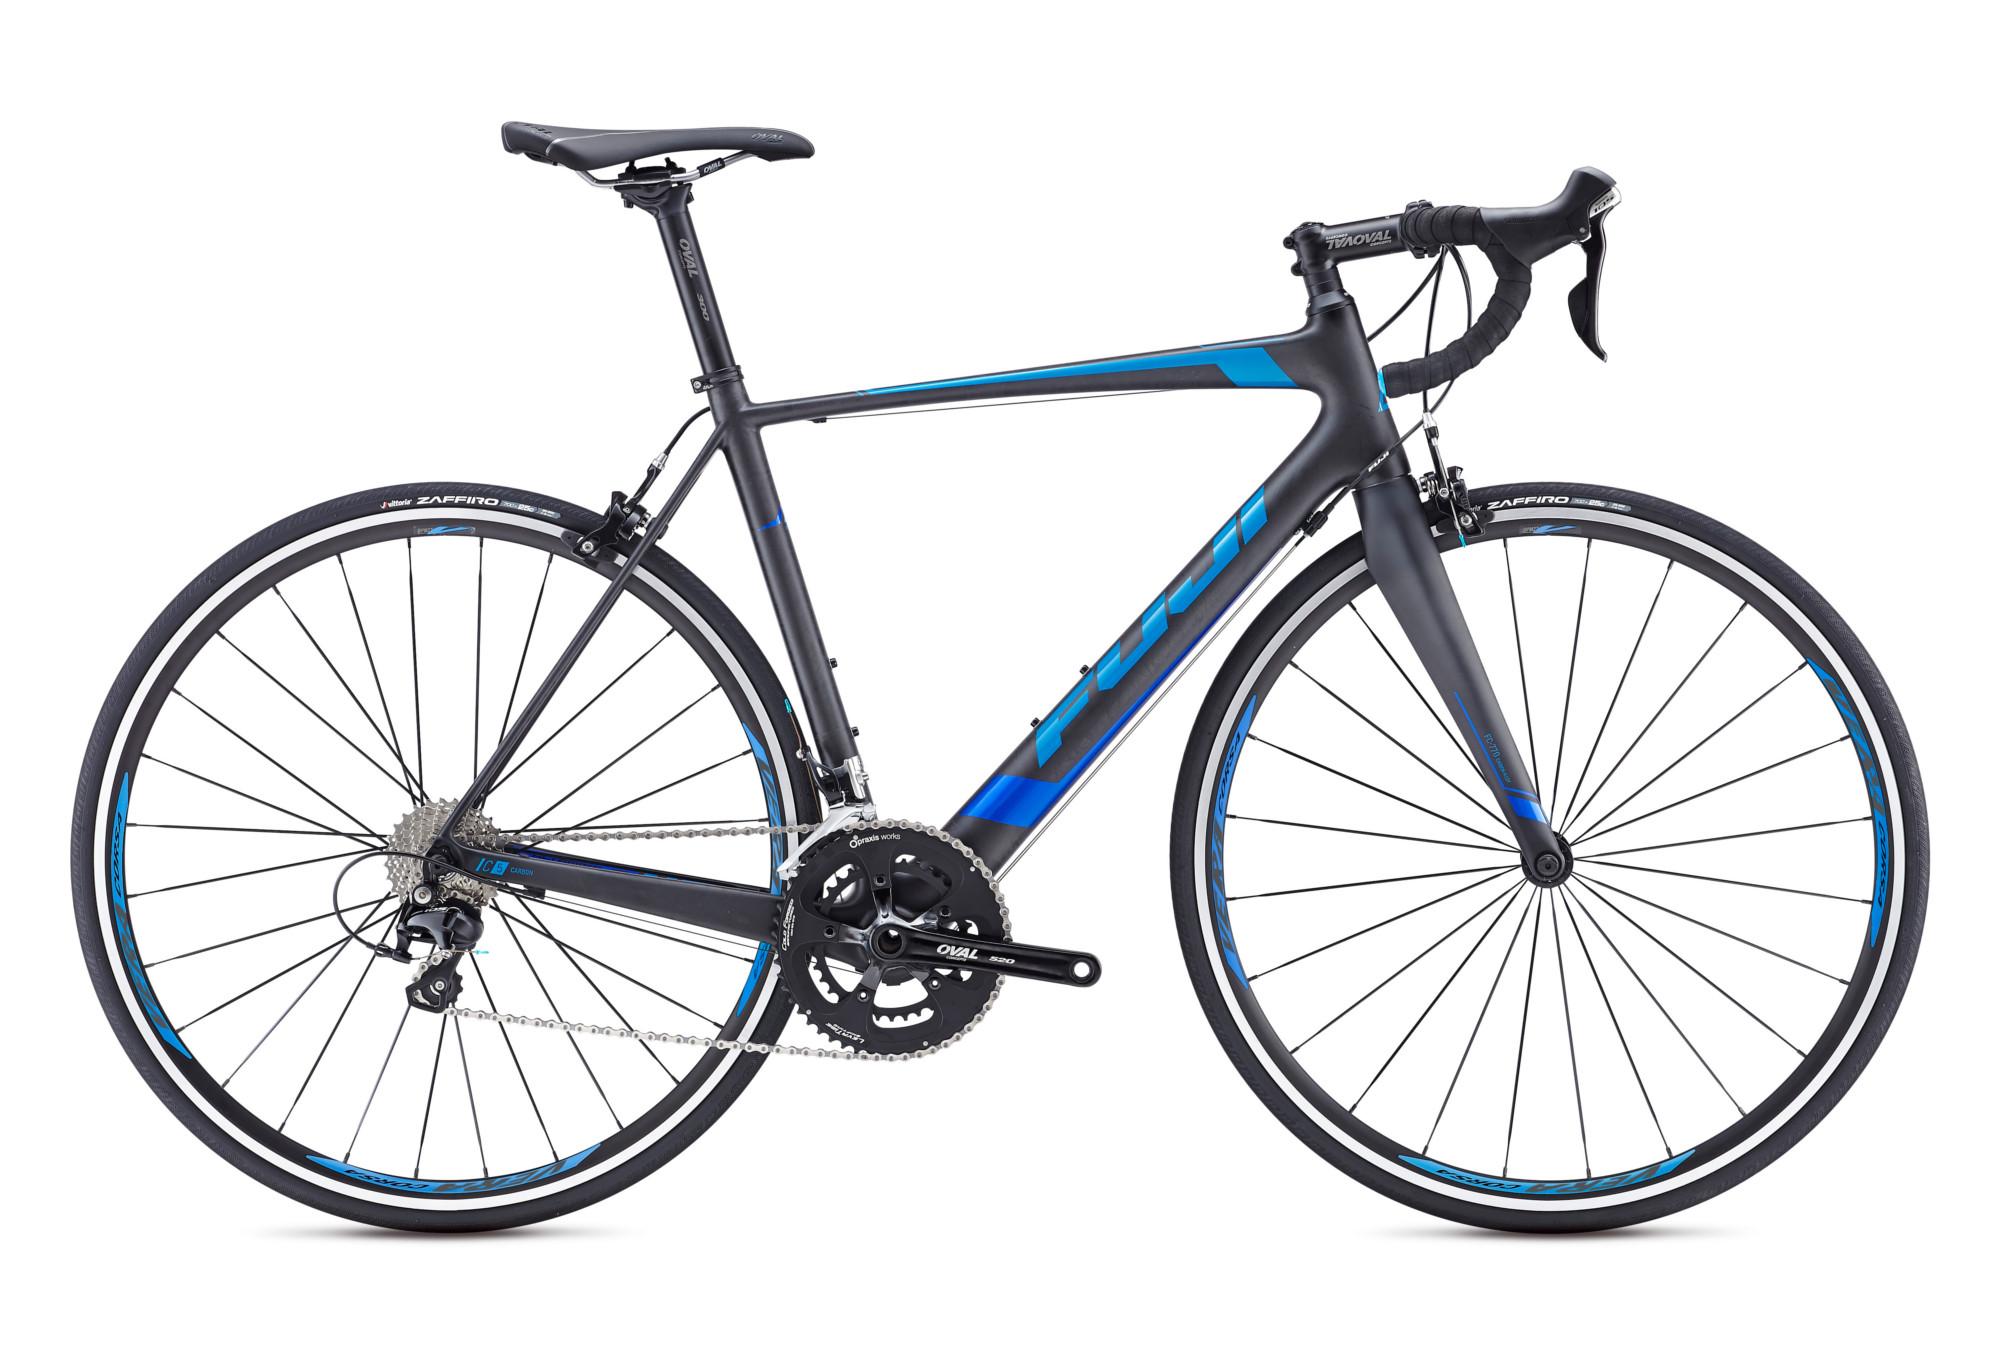 Fuji 2016 Road Bike Altamira 1 3 Shimano 105 11s Black Blue